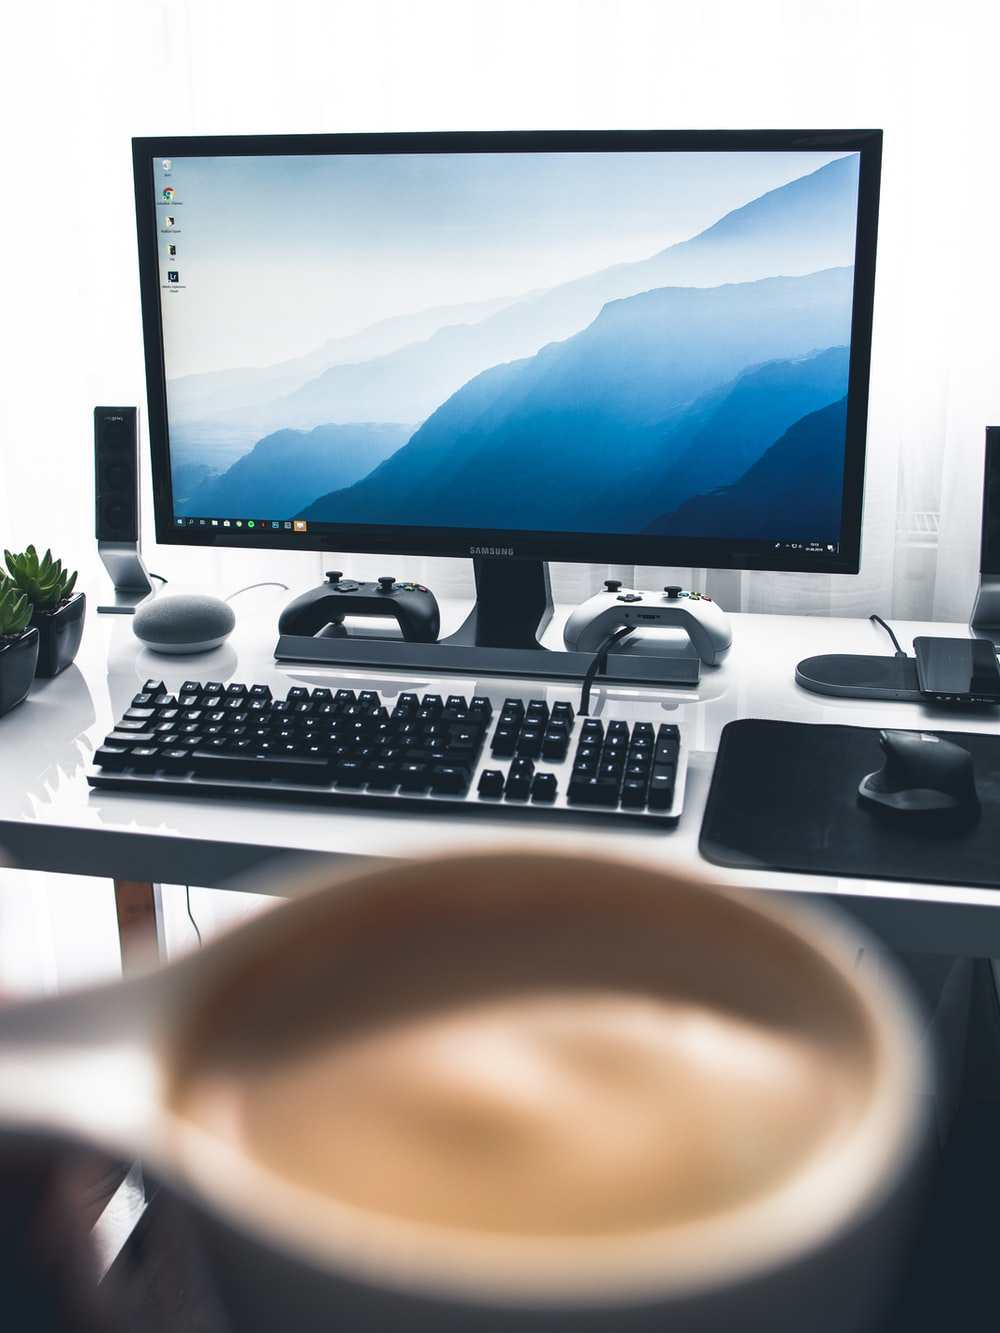 black flat screen computer monitor and black computer keyboard on white desk